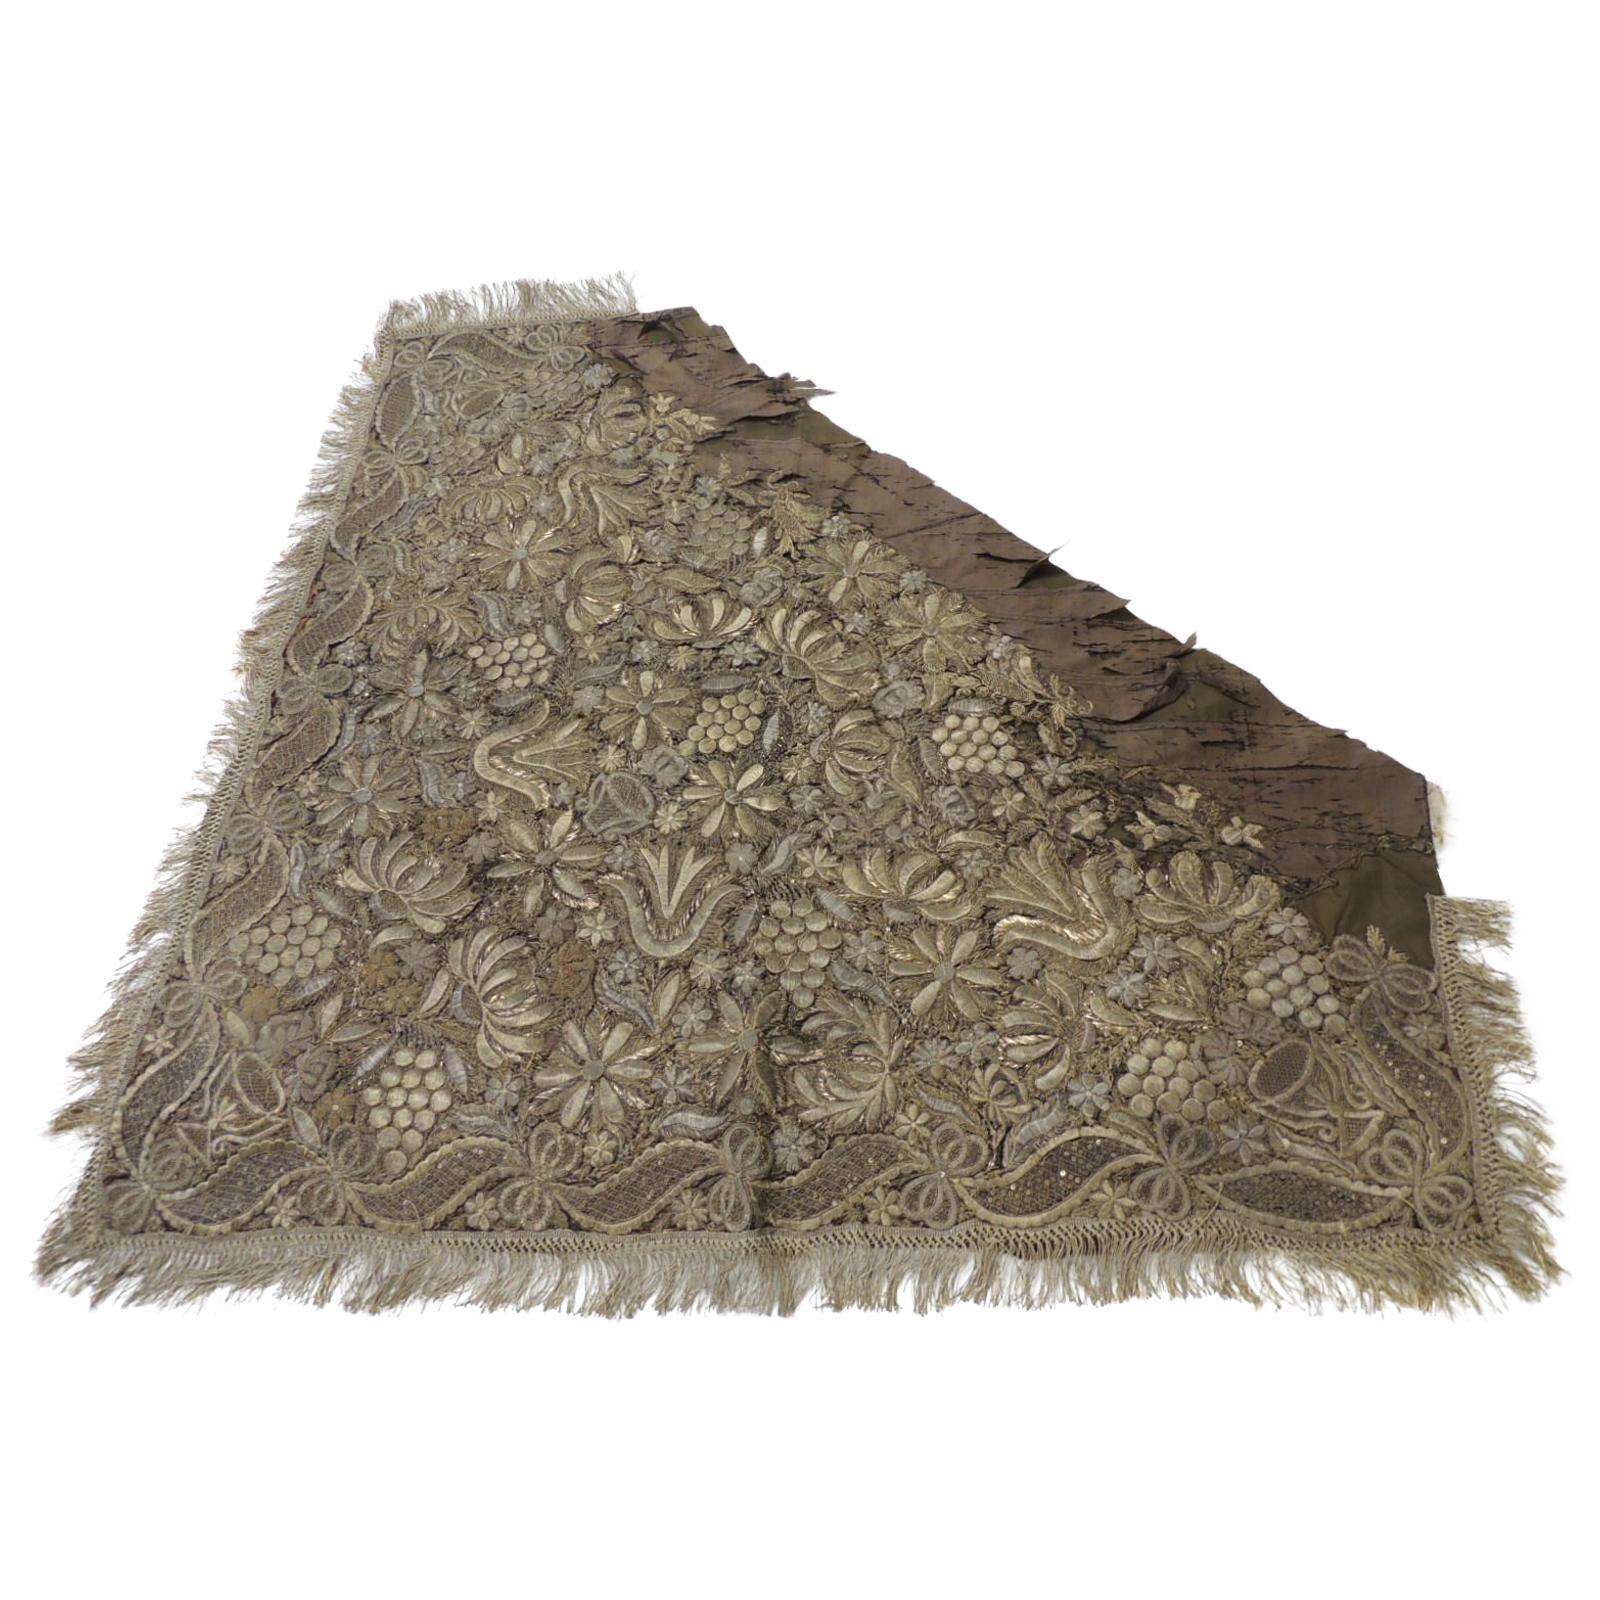 18th Century Persian Ottoman Empire Heavy Gold Metallic Threads Textile